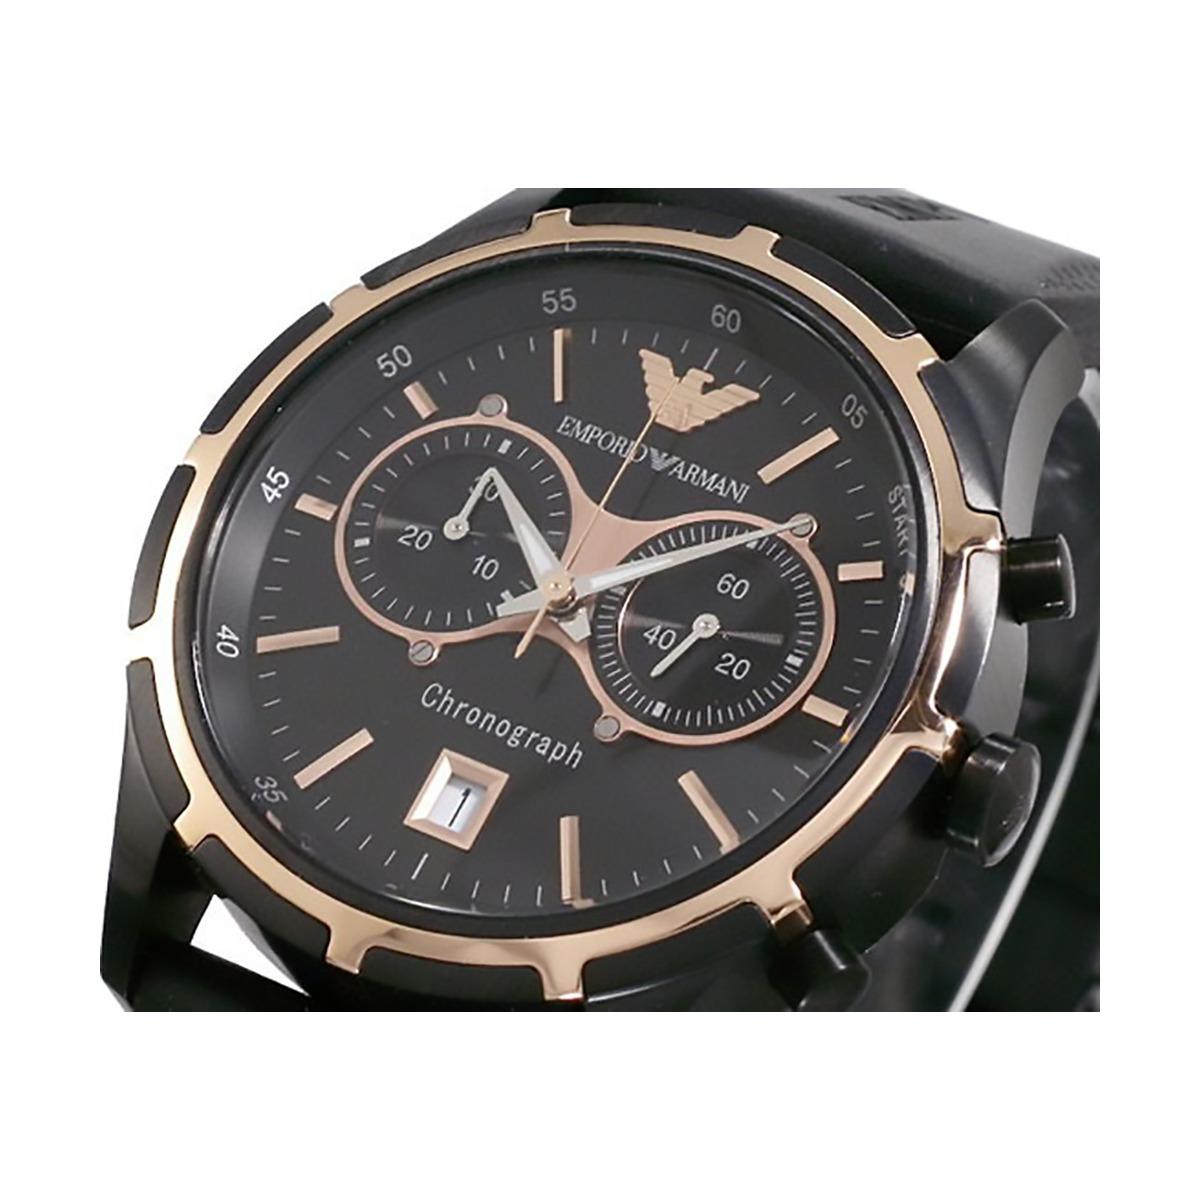 9f5ac4c8509a reloj emporio armani ar0584 para hombre. Cargando zoom.